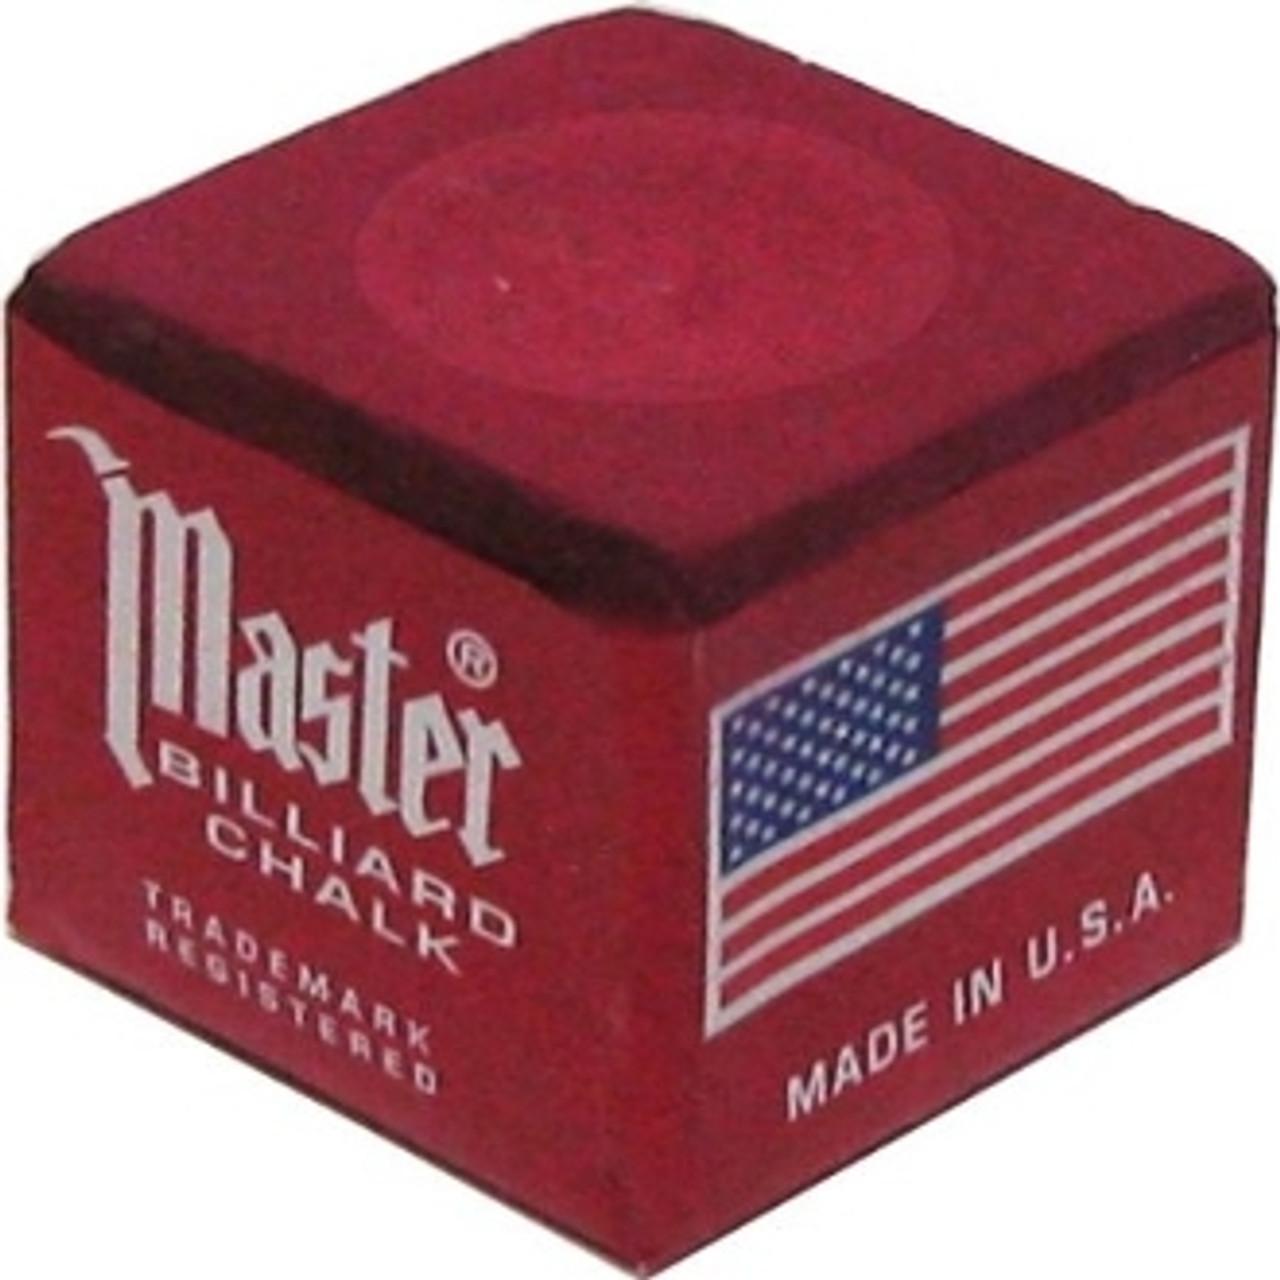 Masters Billiards Chalk Burgundy